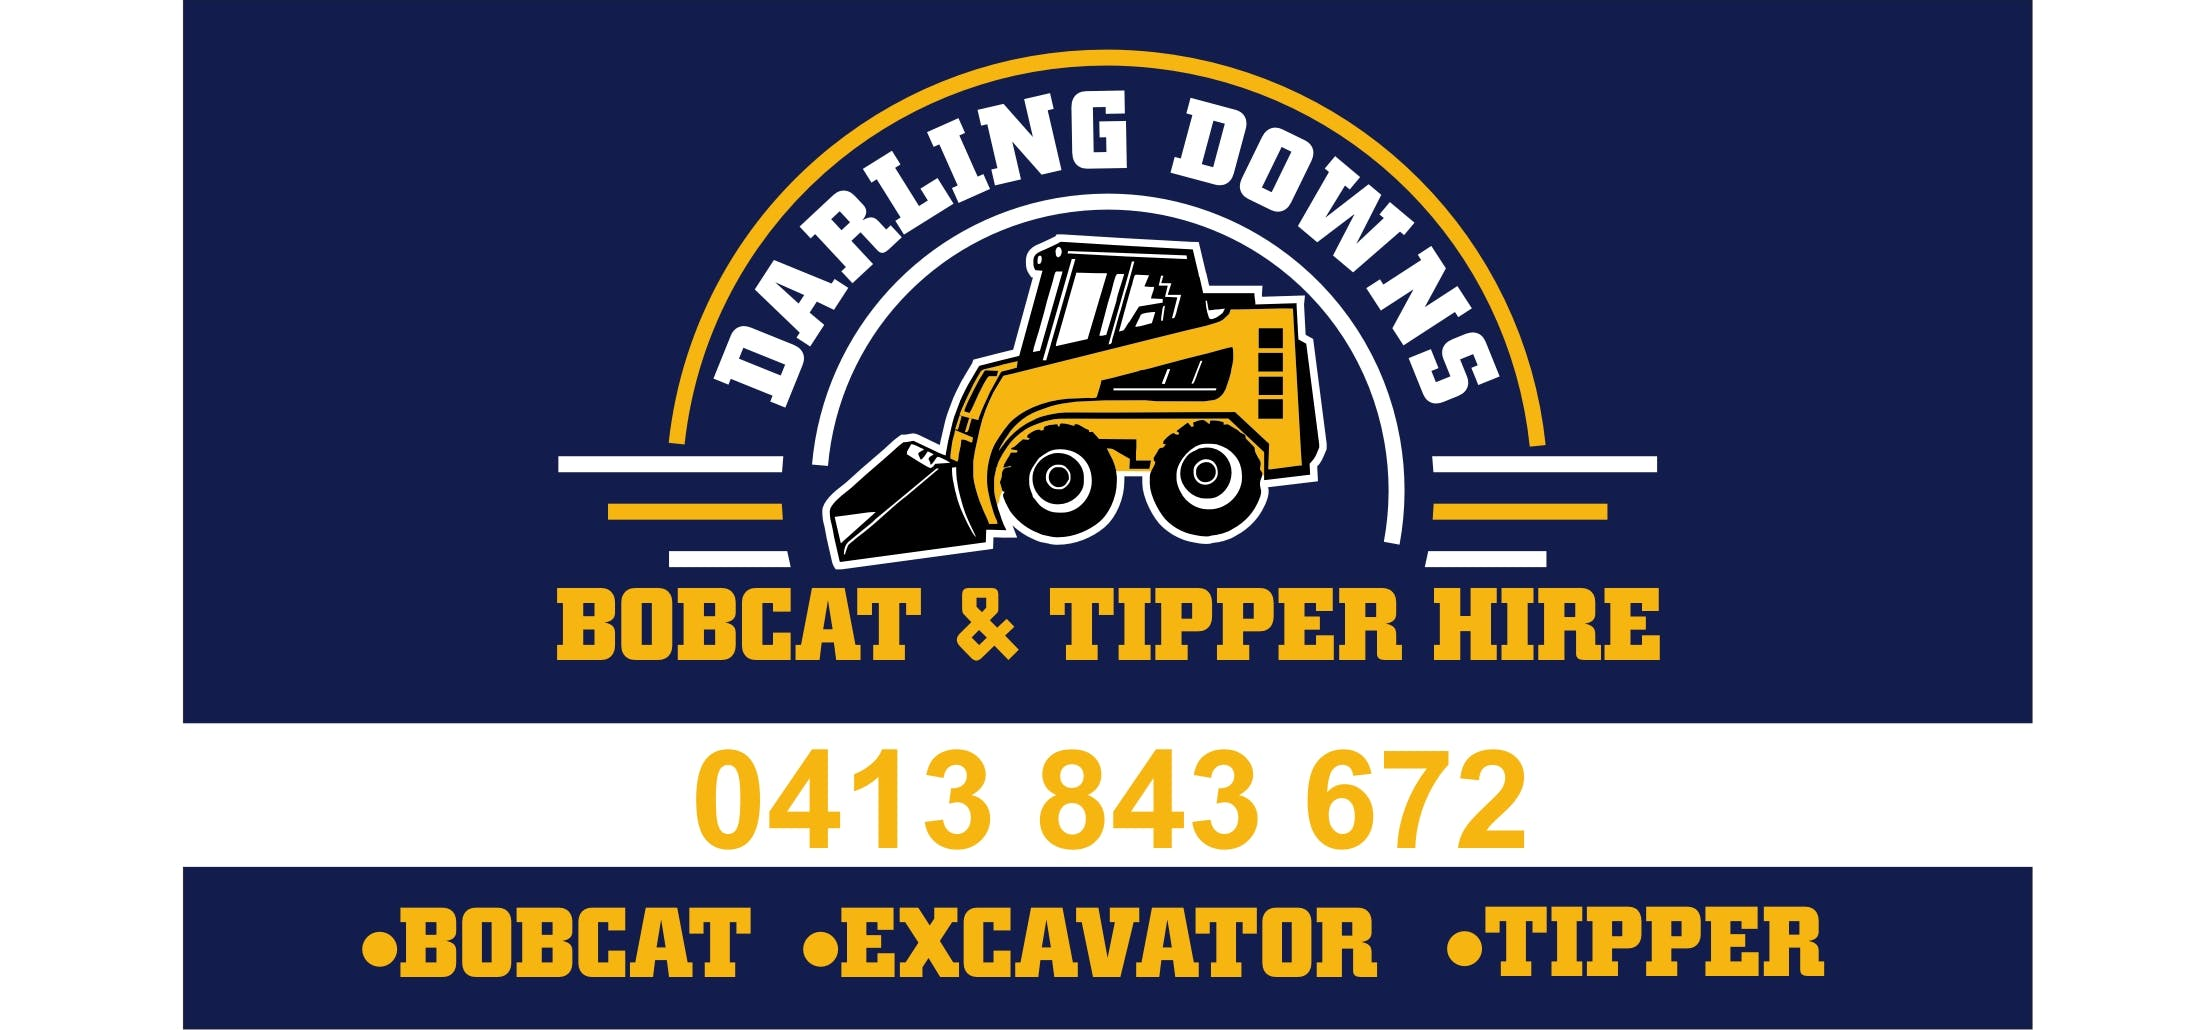 Darling Downs Bobcat and Tipper Hire